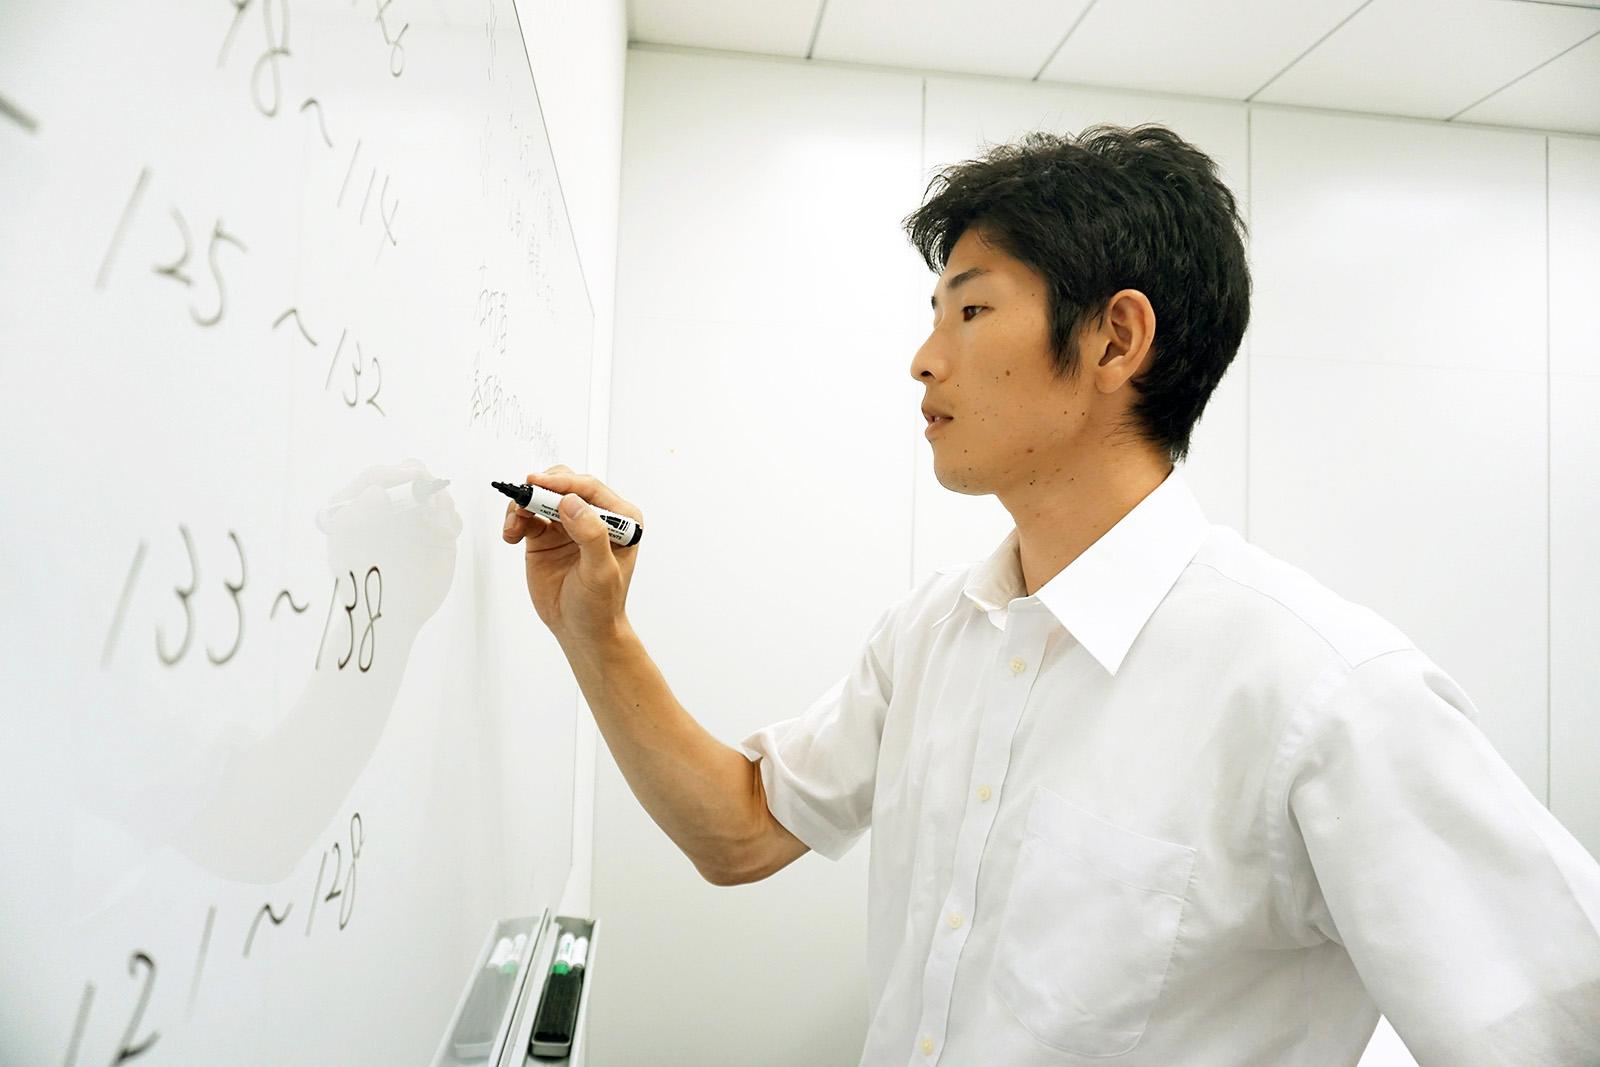 1.whiteboard